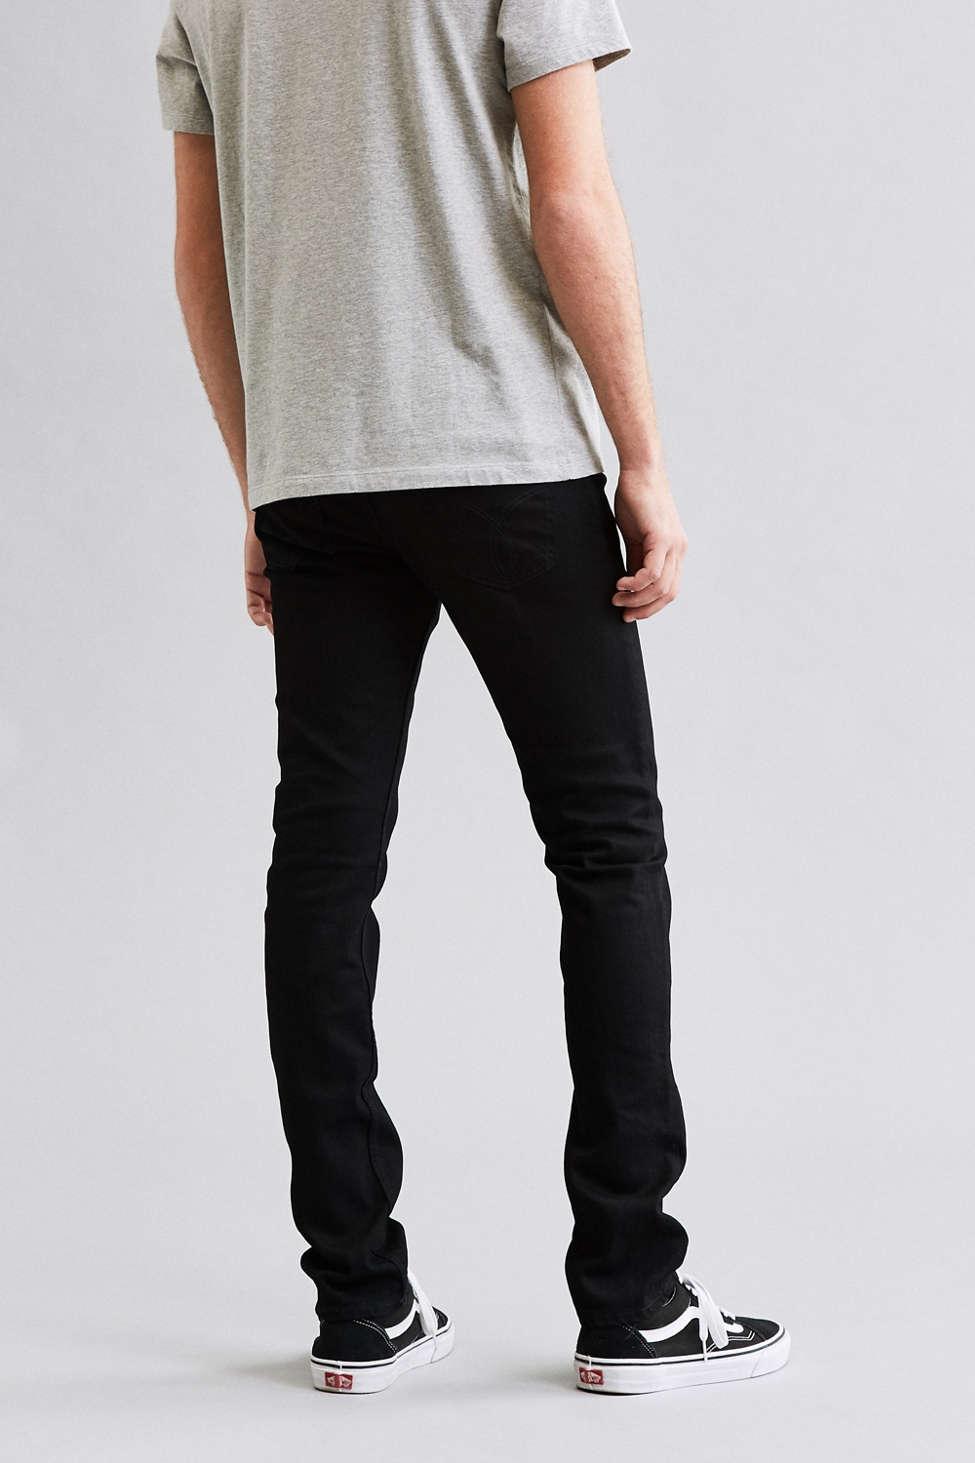 Calvin Klein Black Stretch Skinny Jean   Urban Outfitters